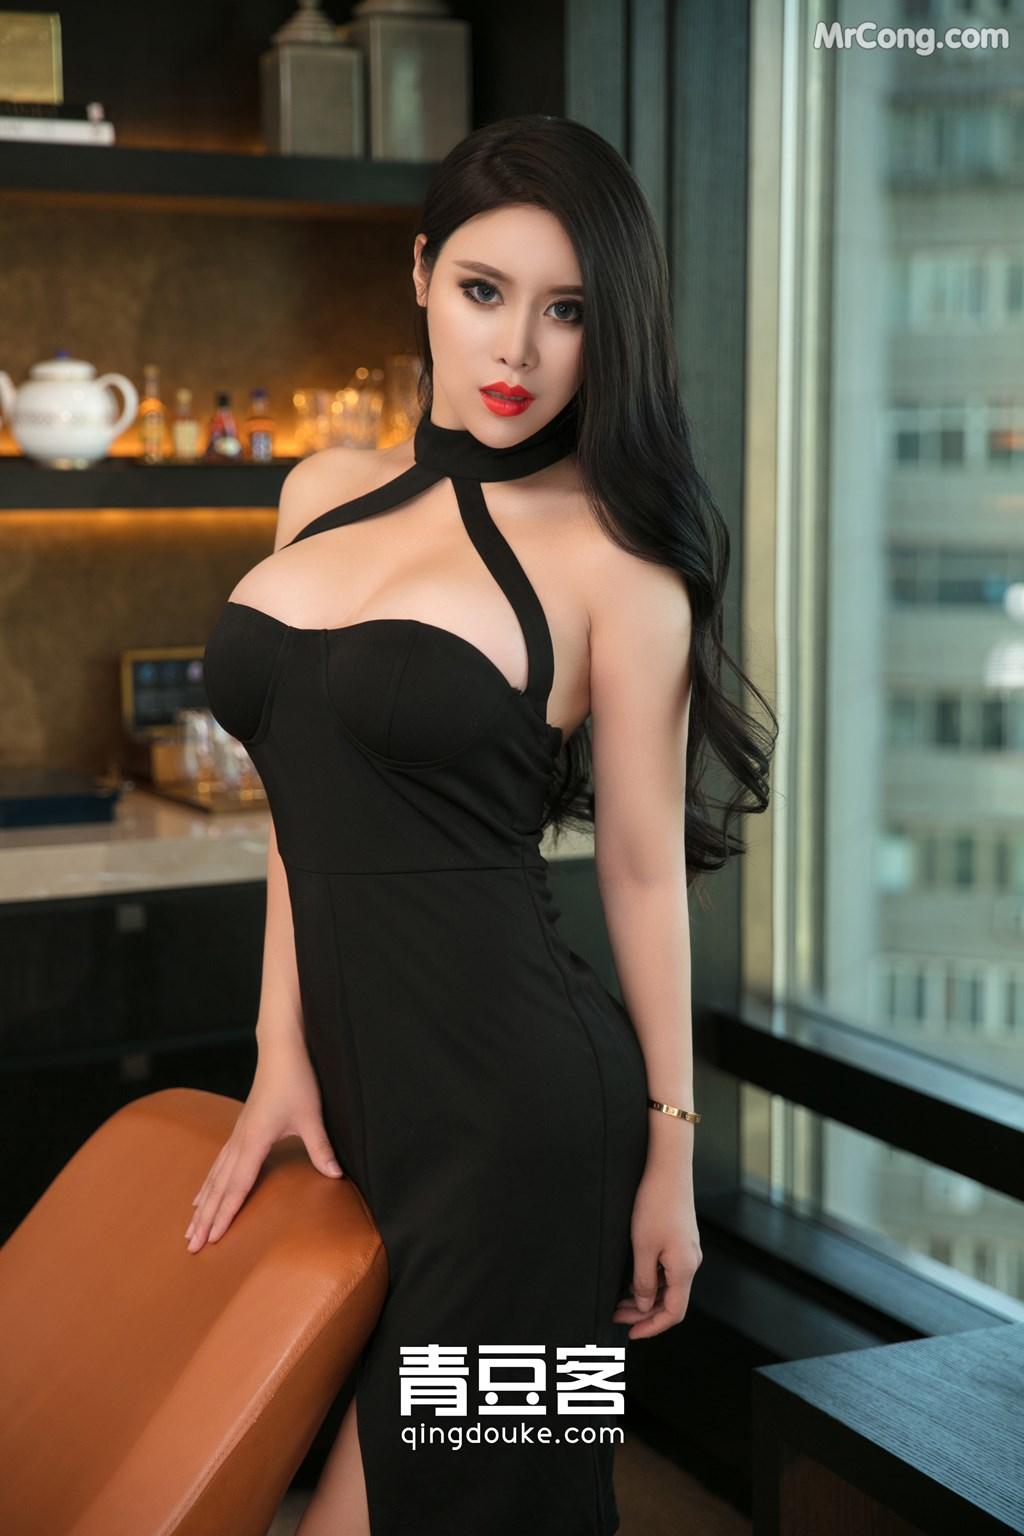 QingDouKe 2017-11-05: Model Ke Rui Na (可 蕊 娜) (48 photos)